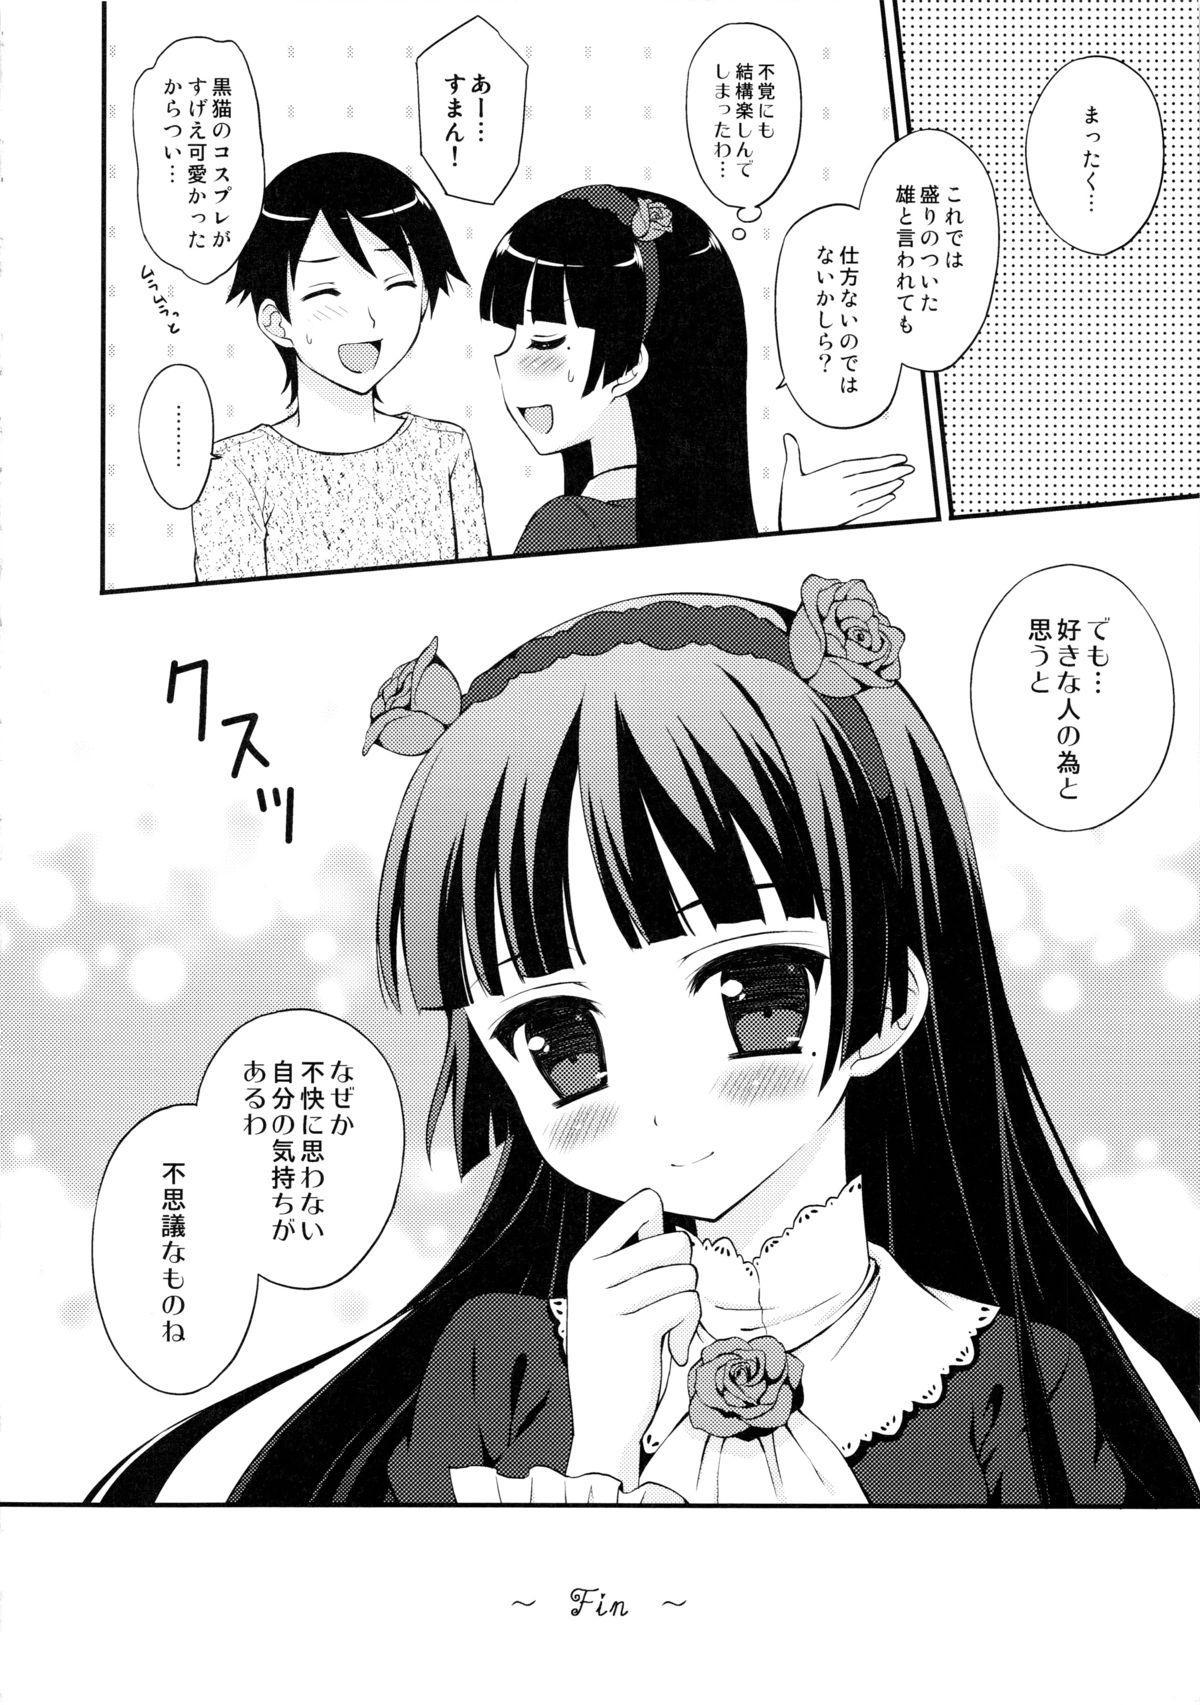 School-mer! School Mizugi Bloomer Joshi Anthology 90